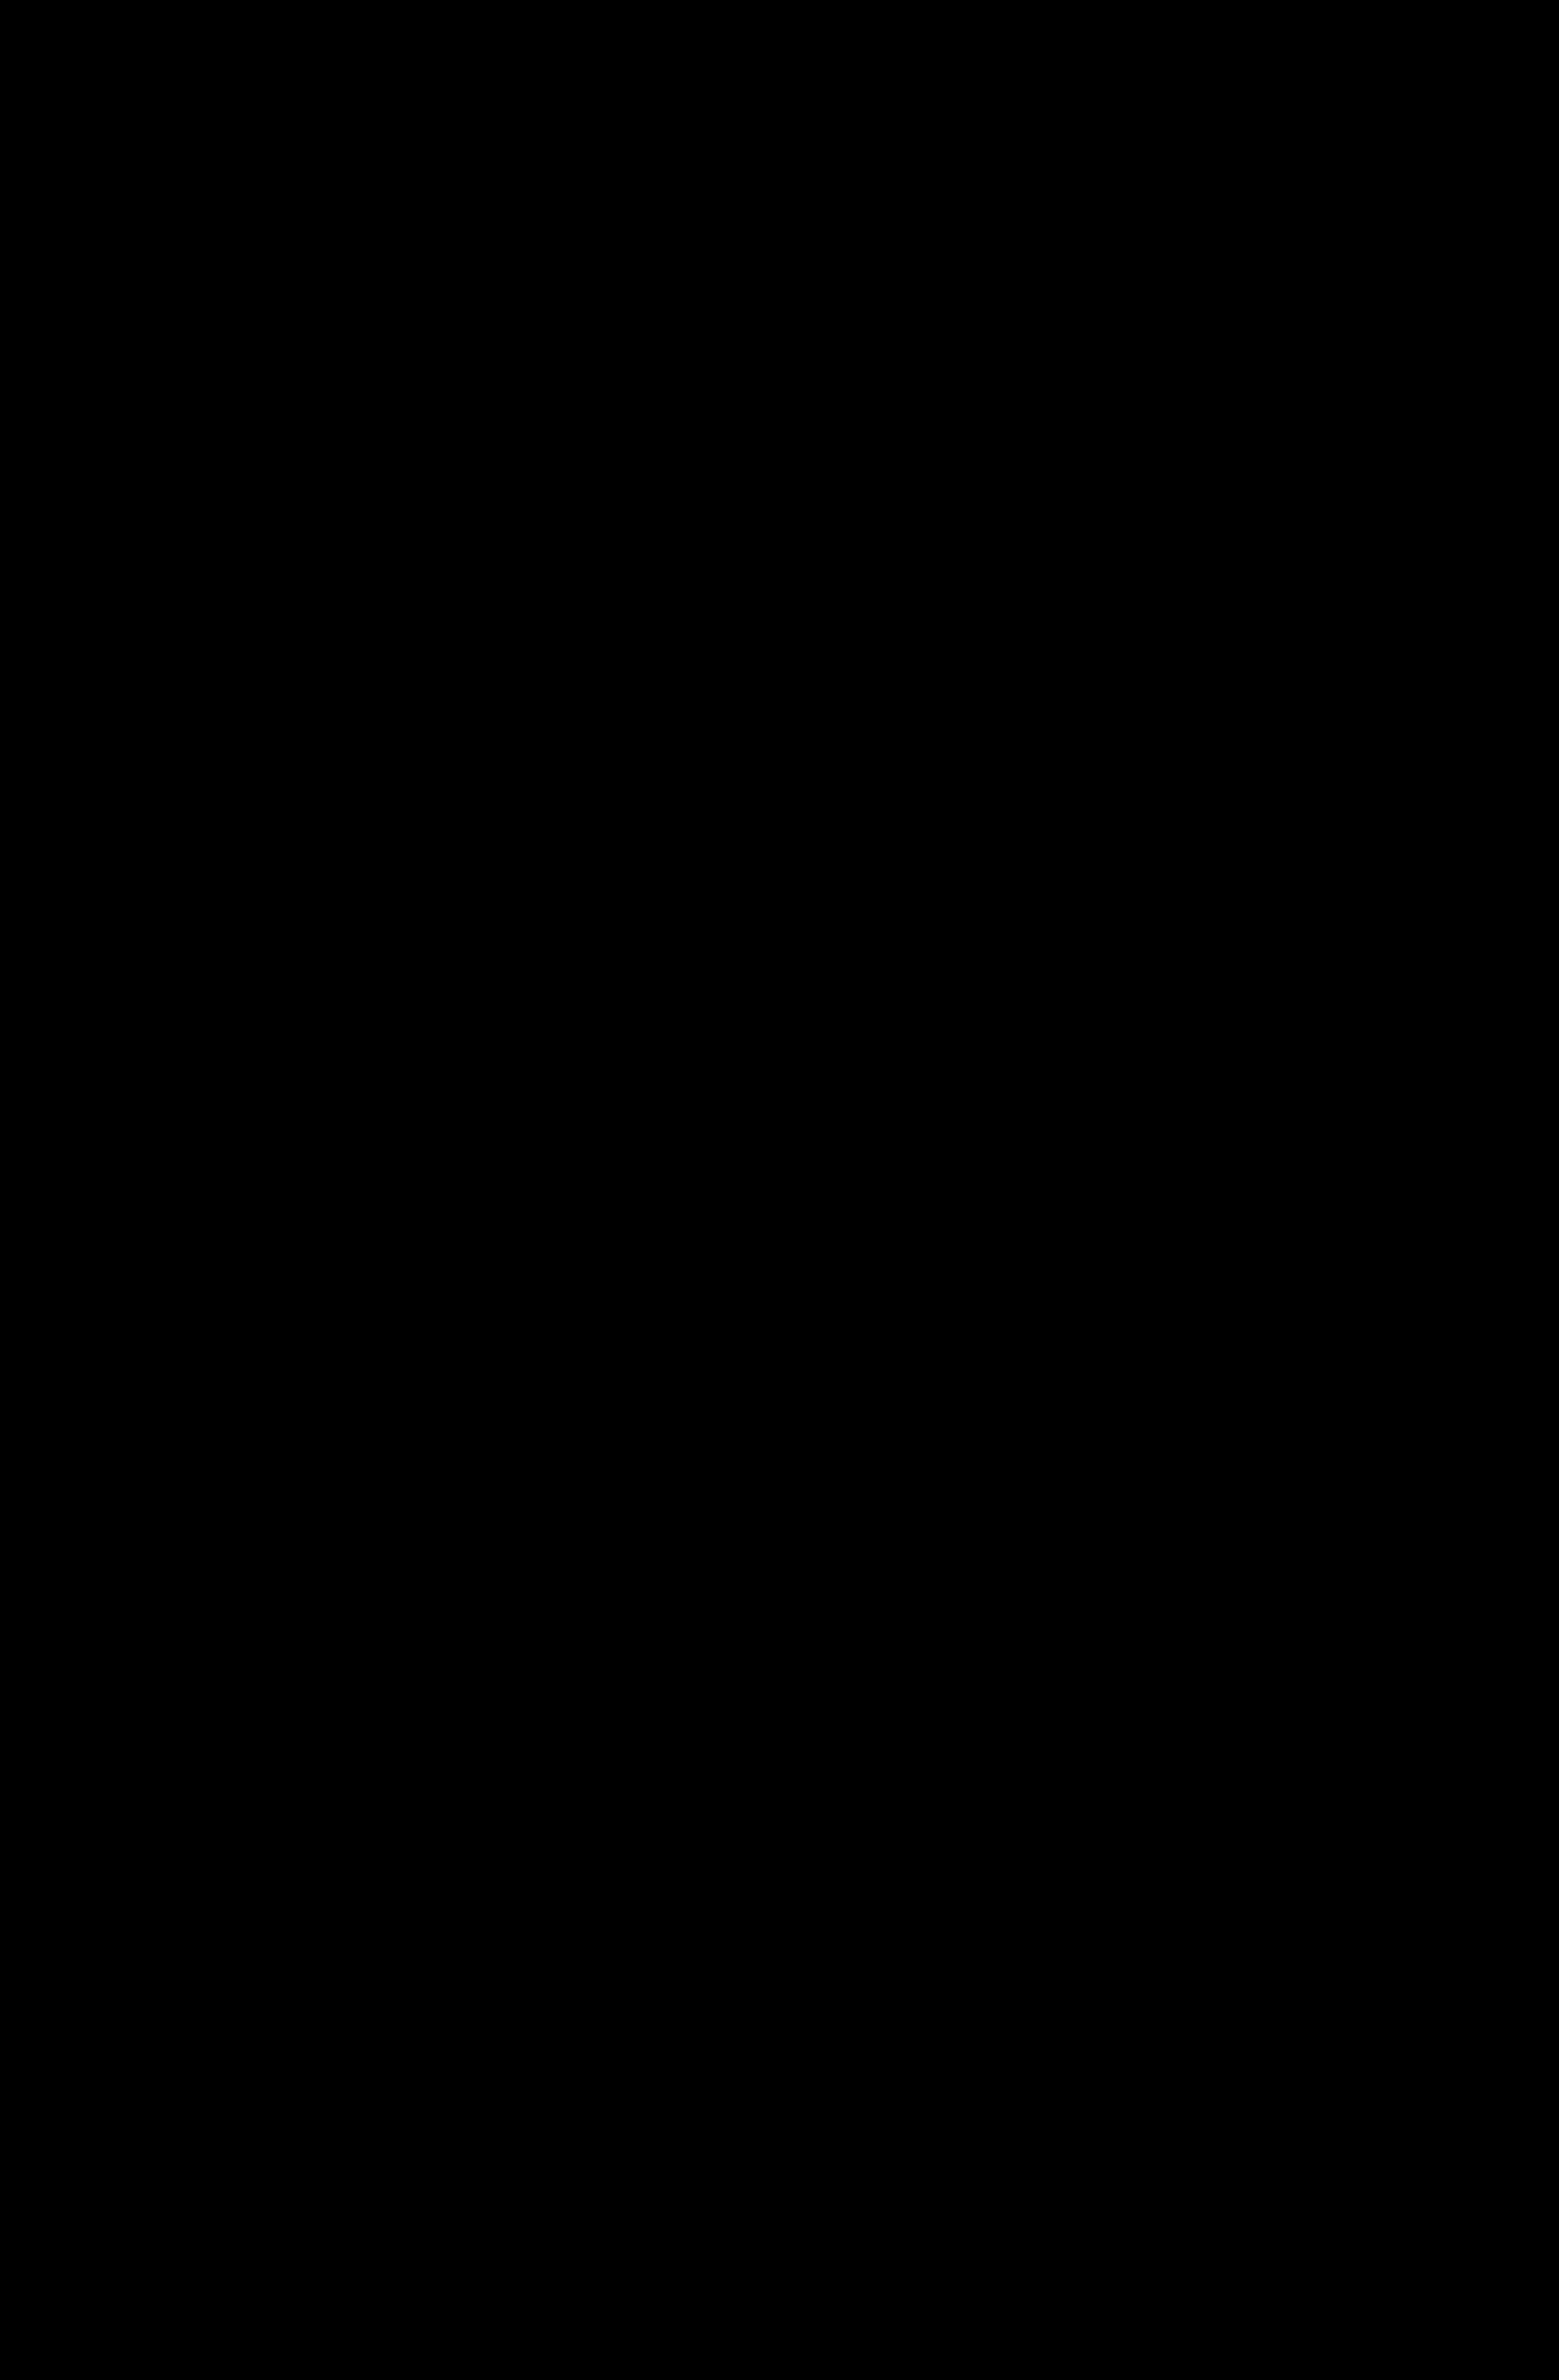 picture transparent stock Clipart